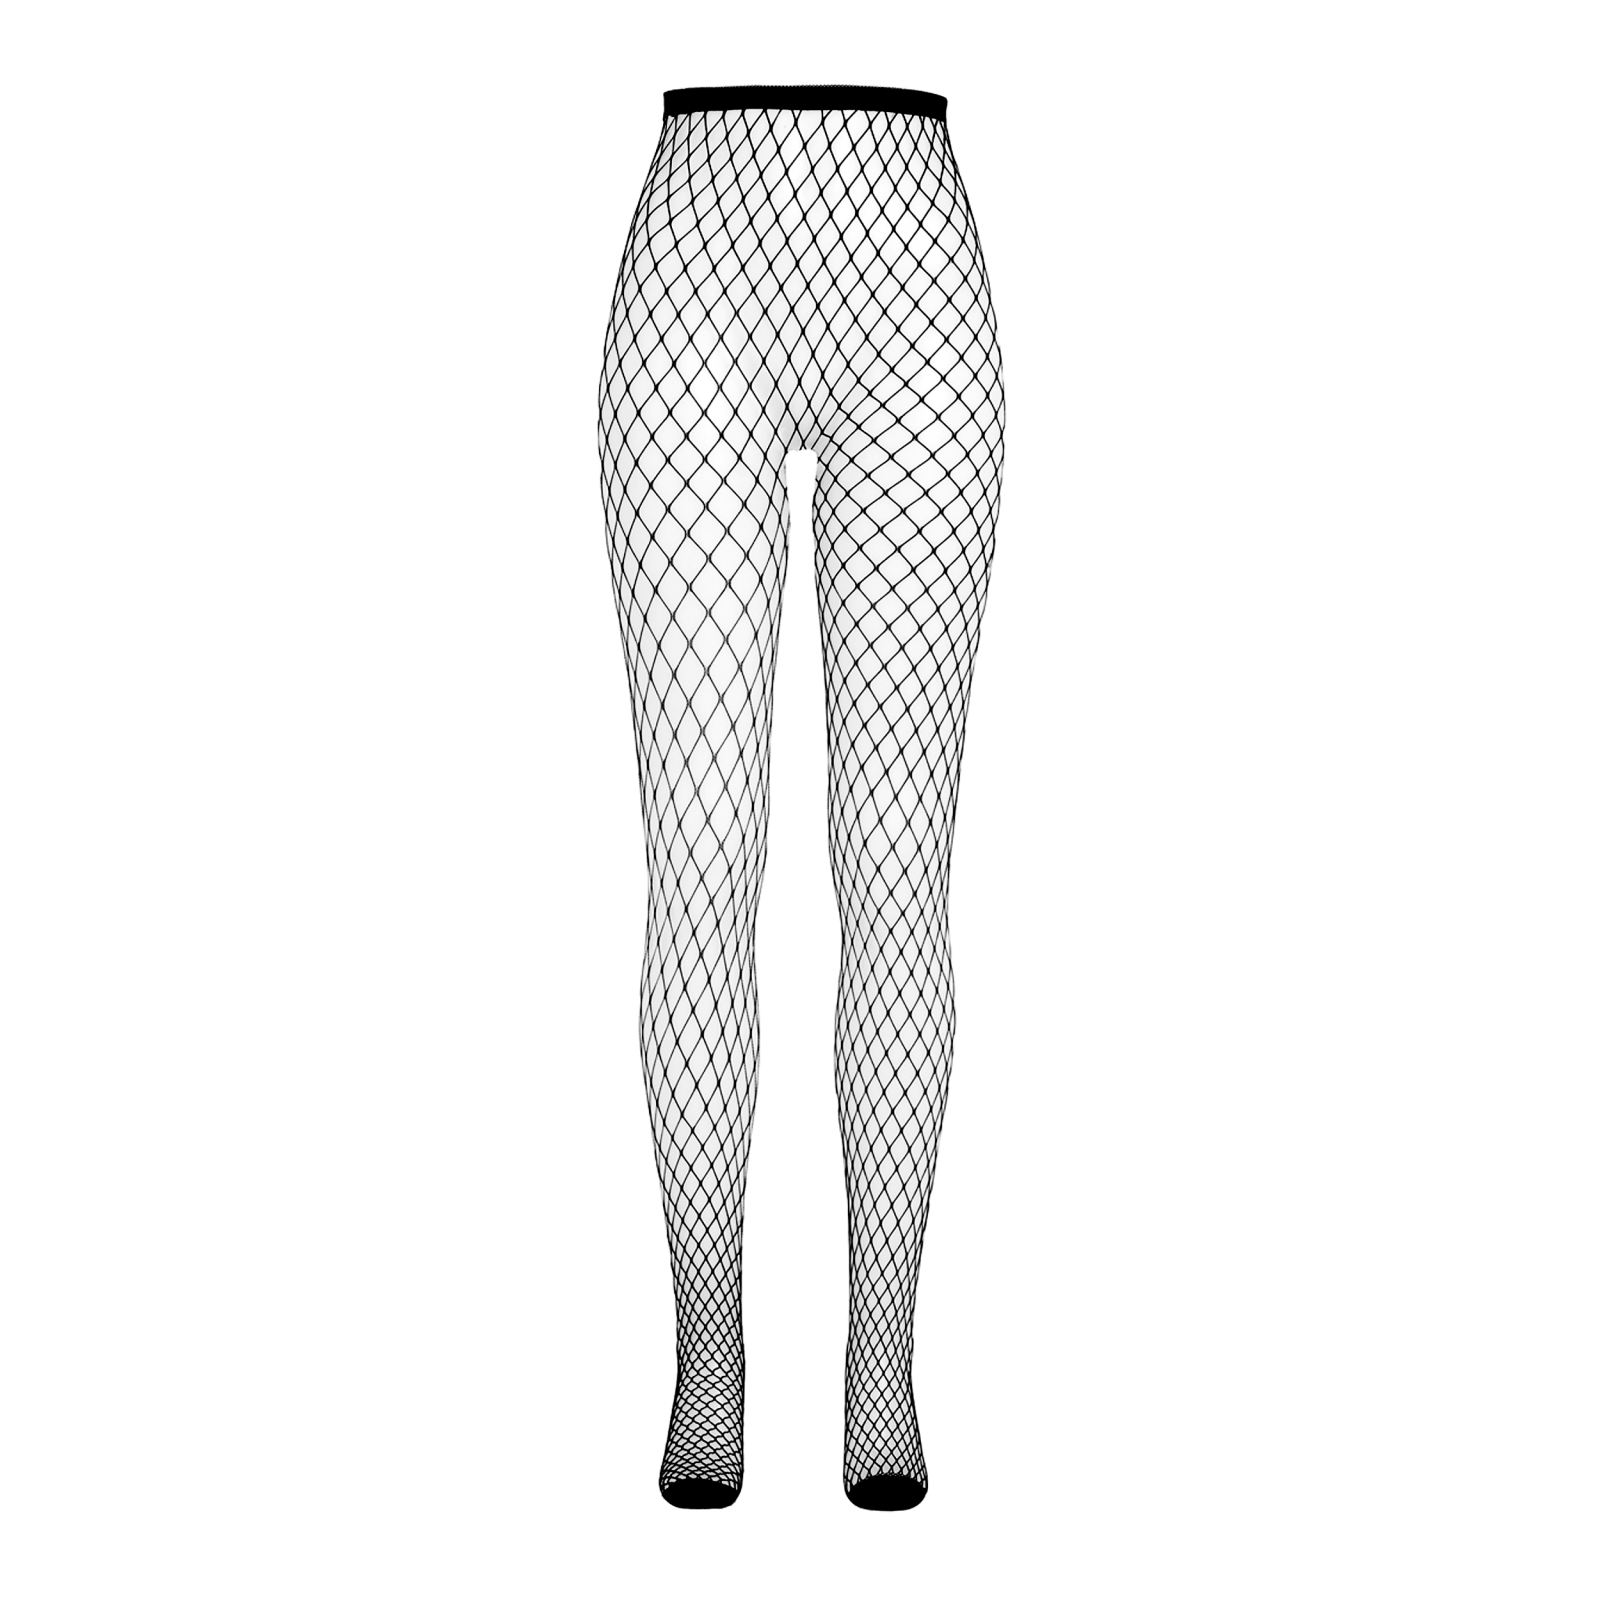 جوراب شلواری زنانه سانپل جیرنو کد RG-SC 100 -  - 2